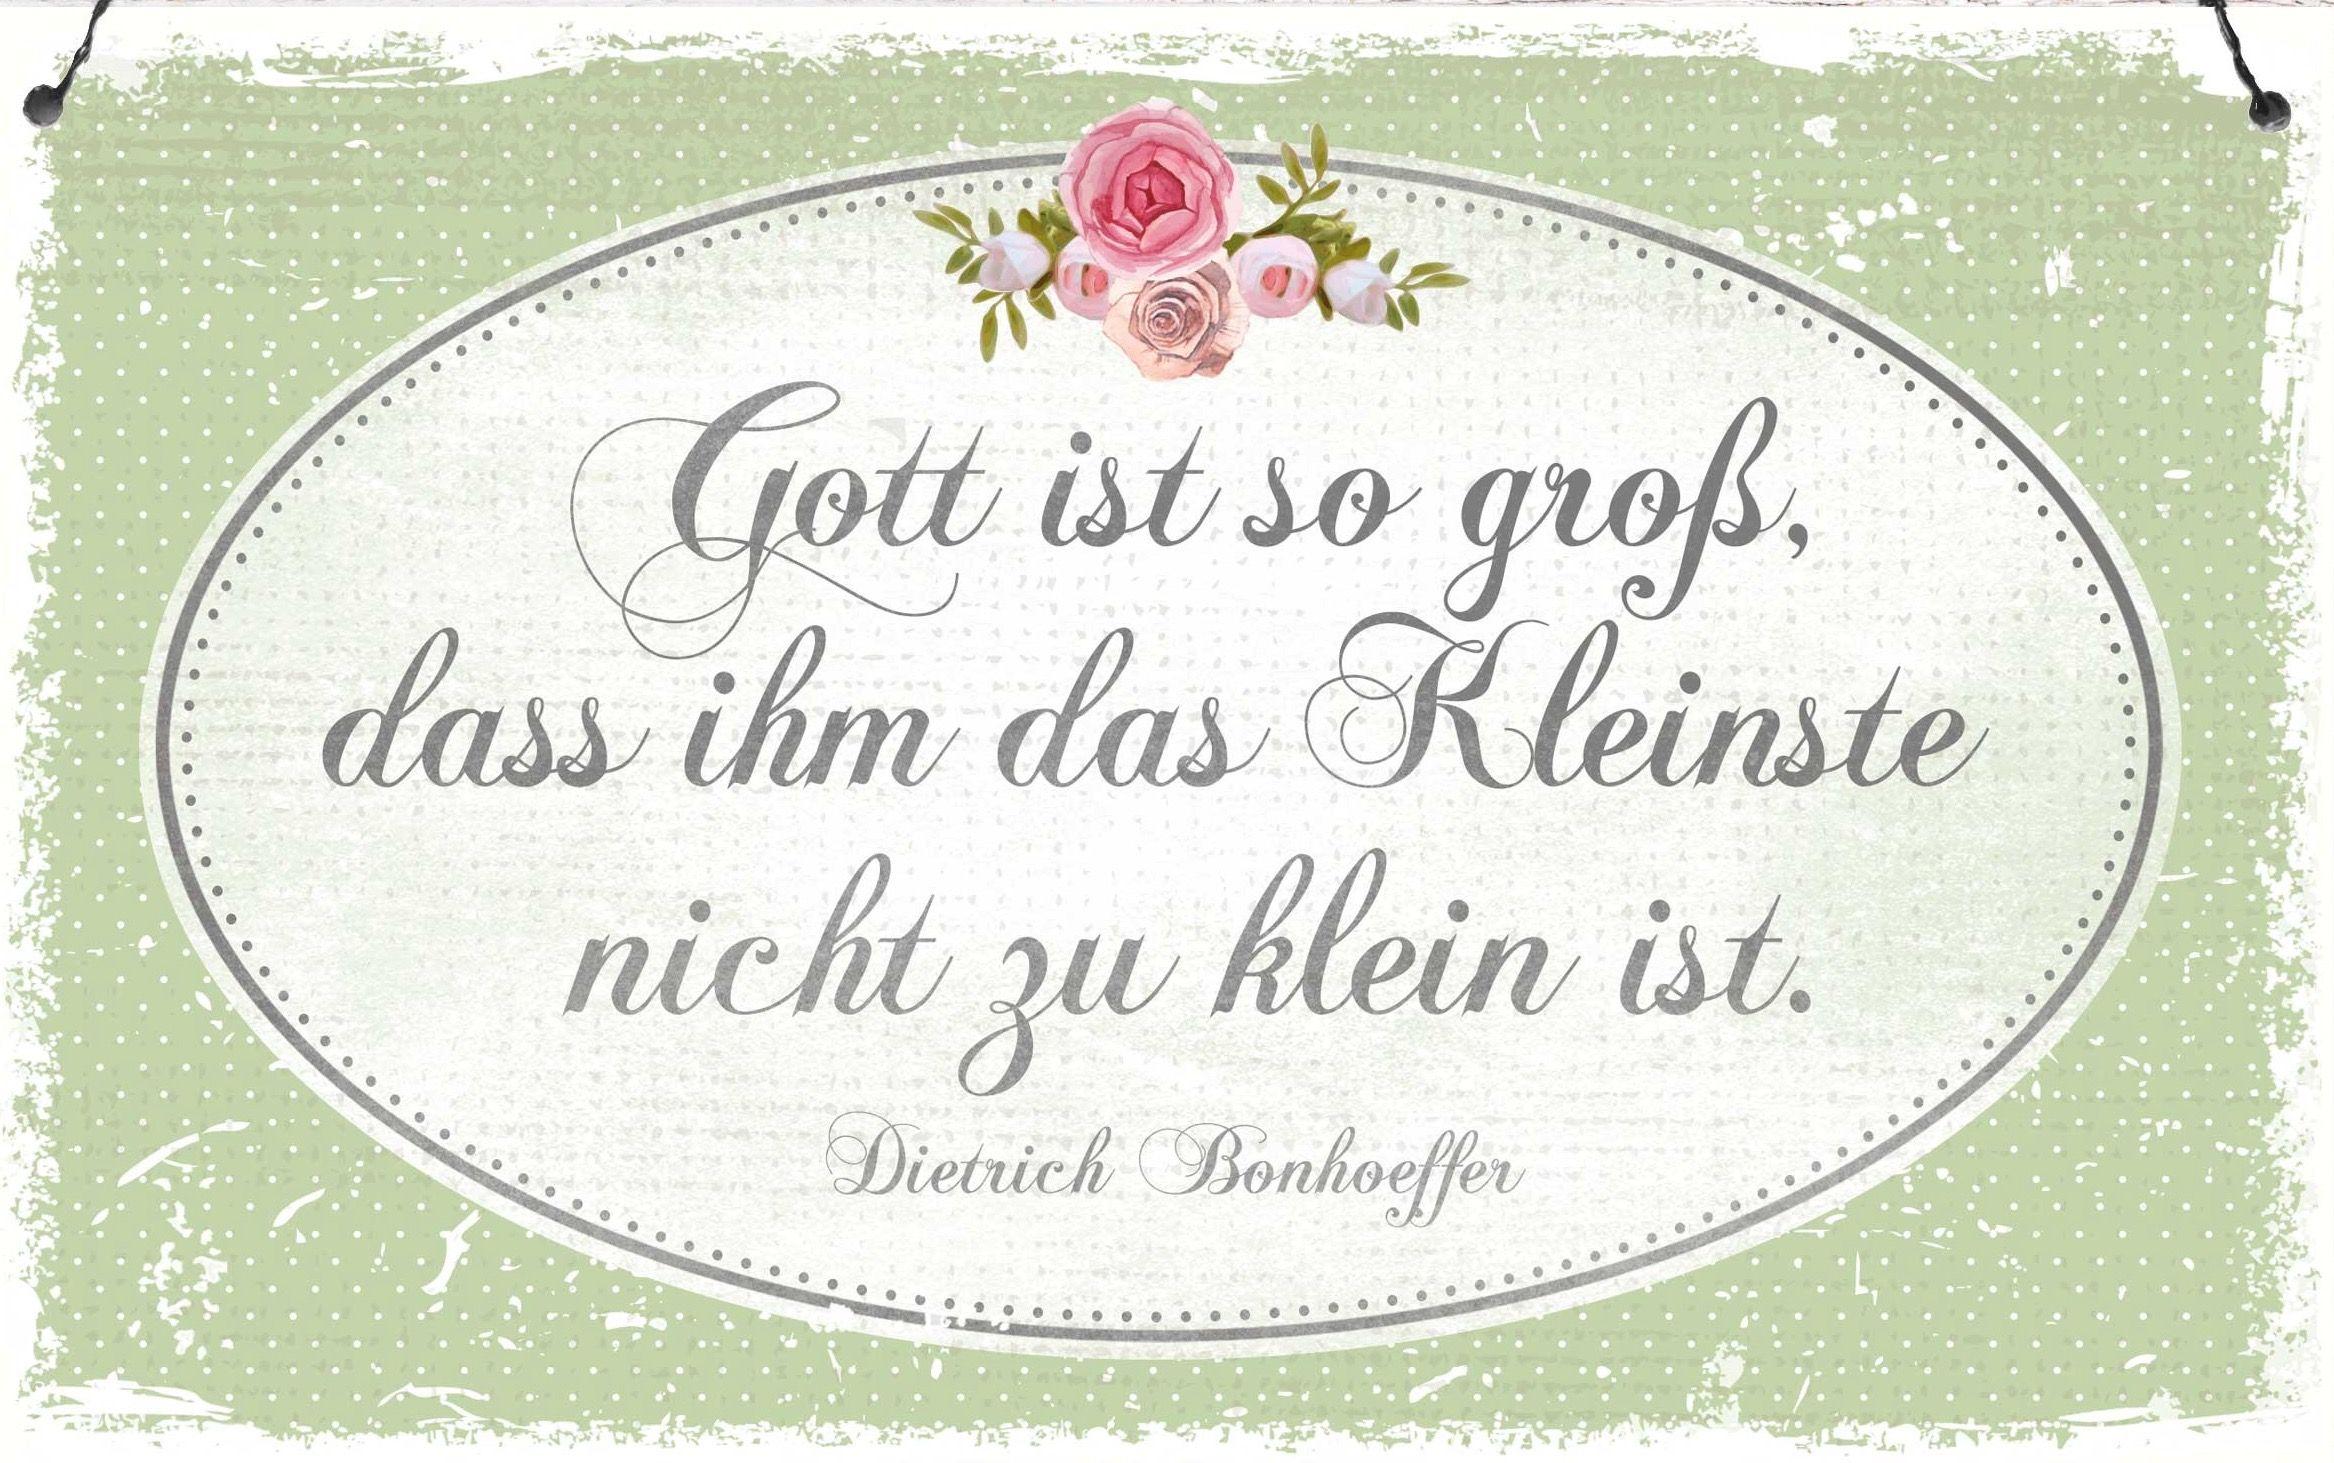 pretty (so i'm Bauern nur Gründer enjoy the